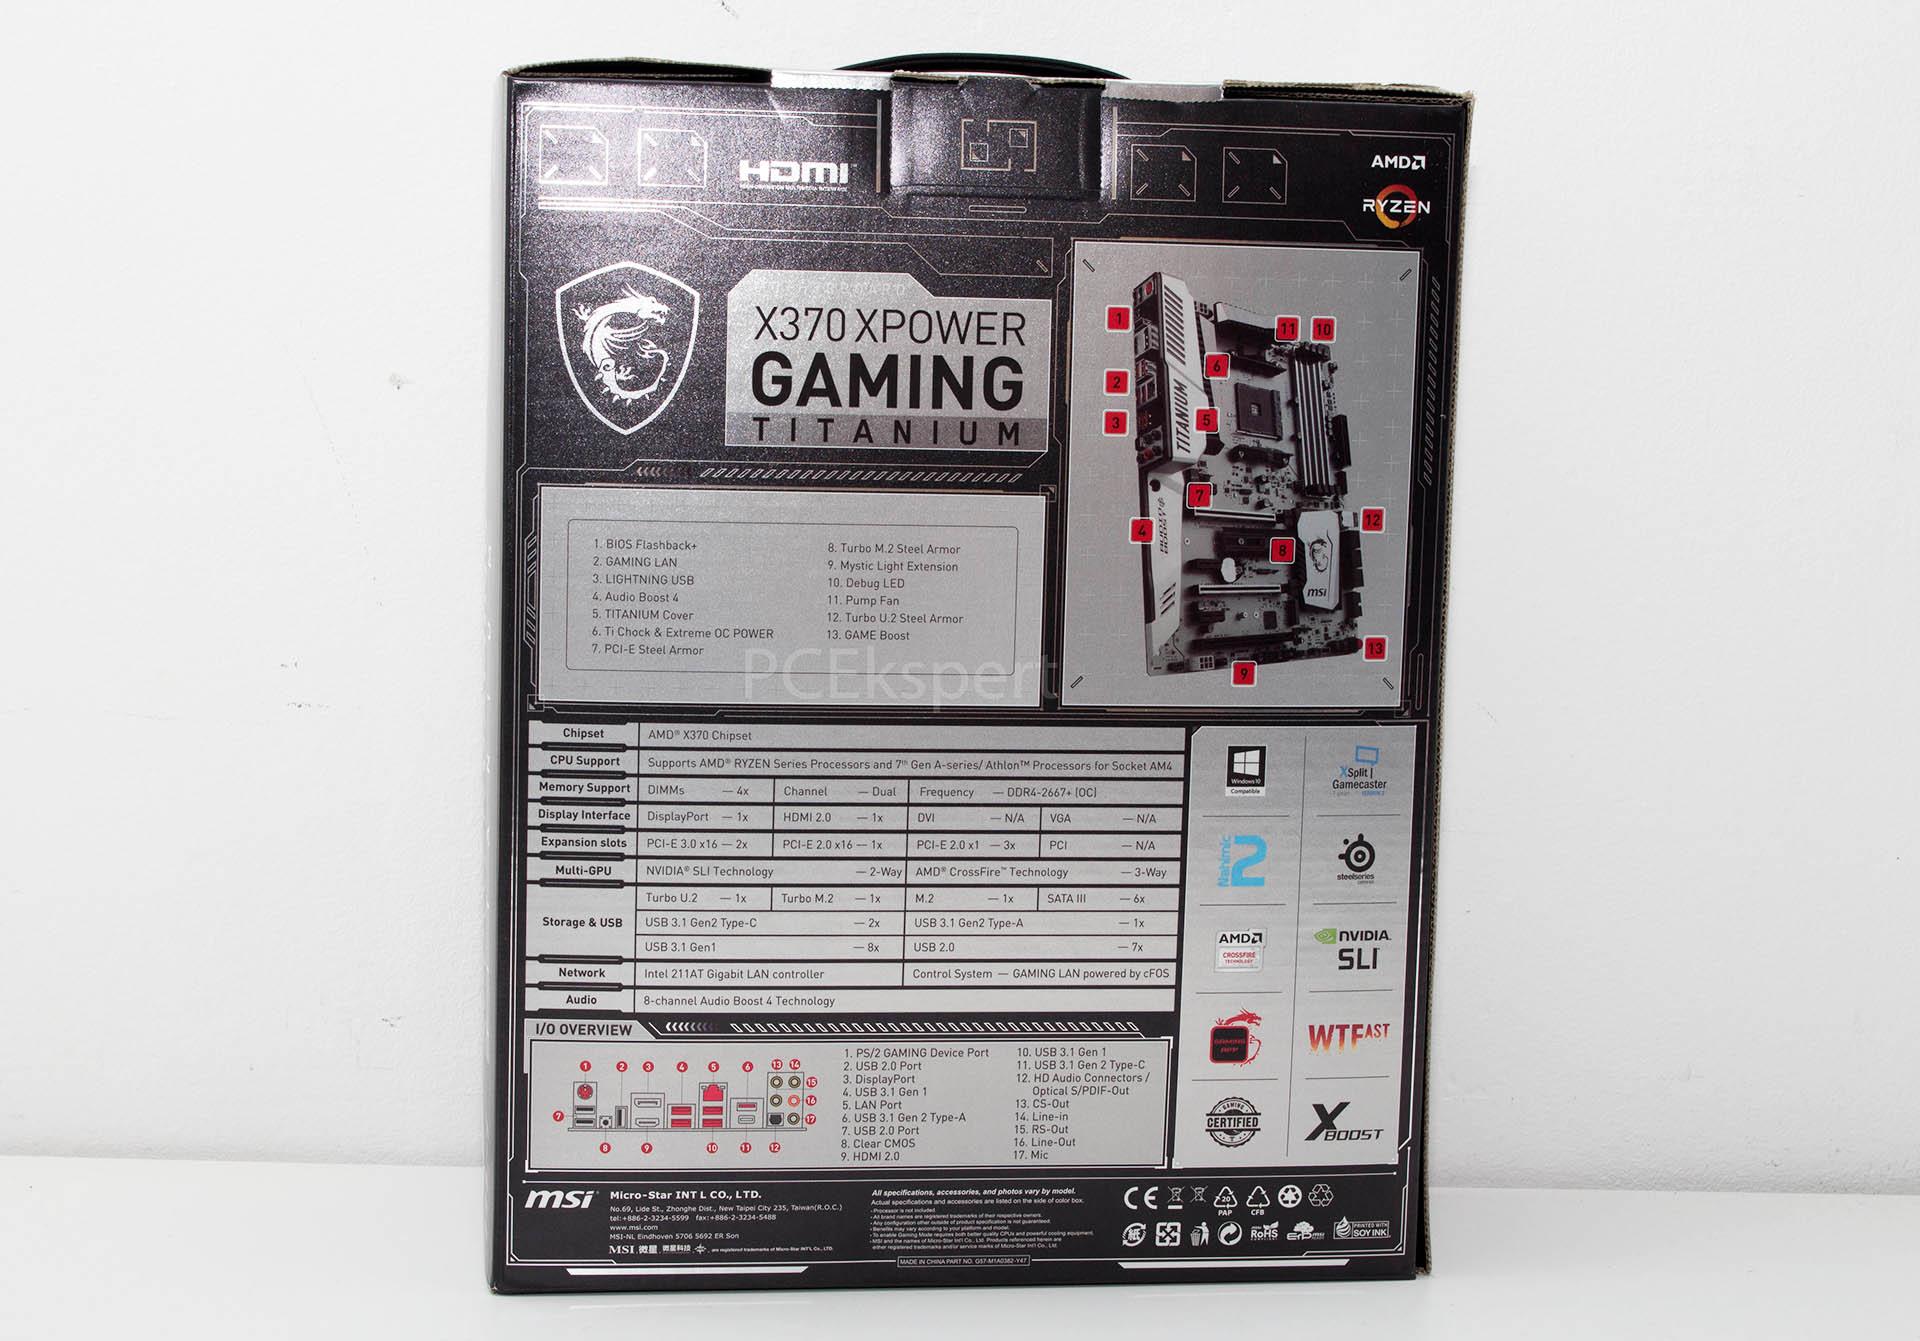 msi x370 xpower gaming titanium manual